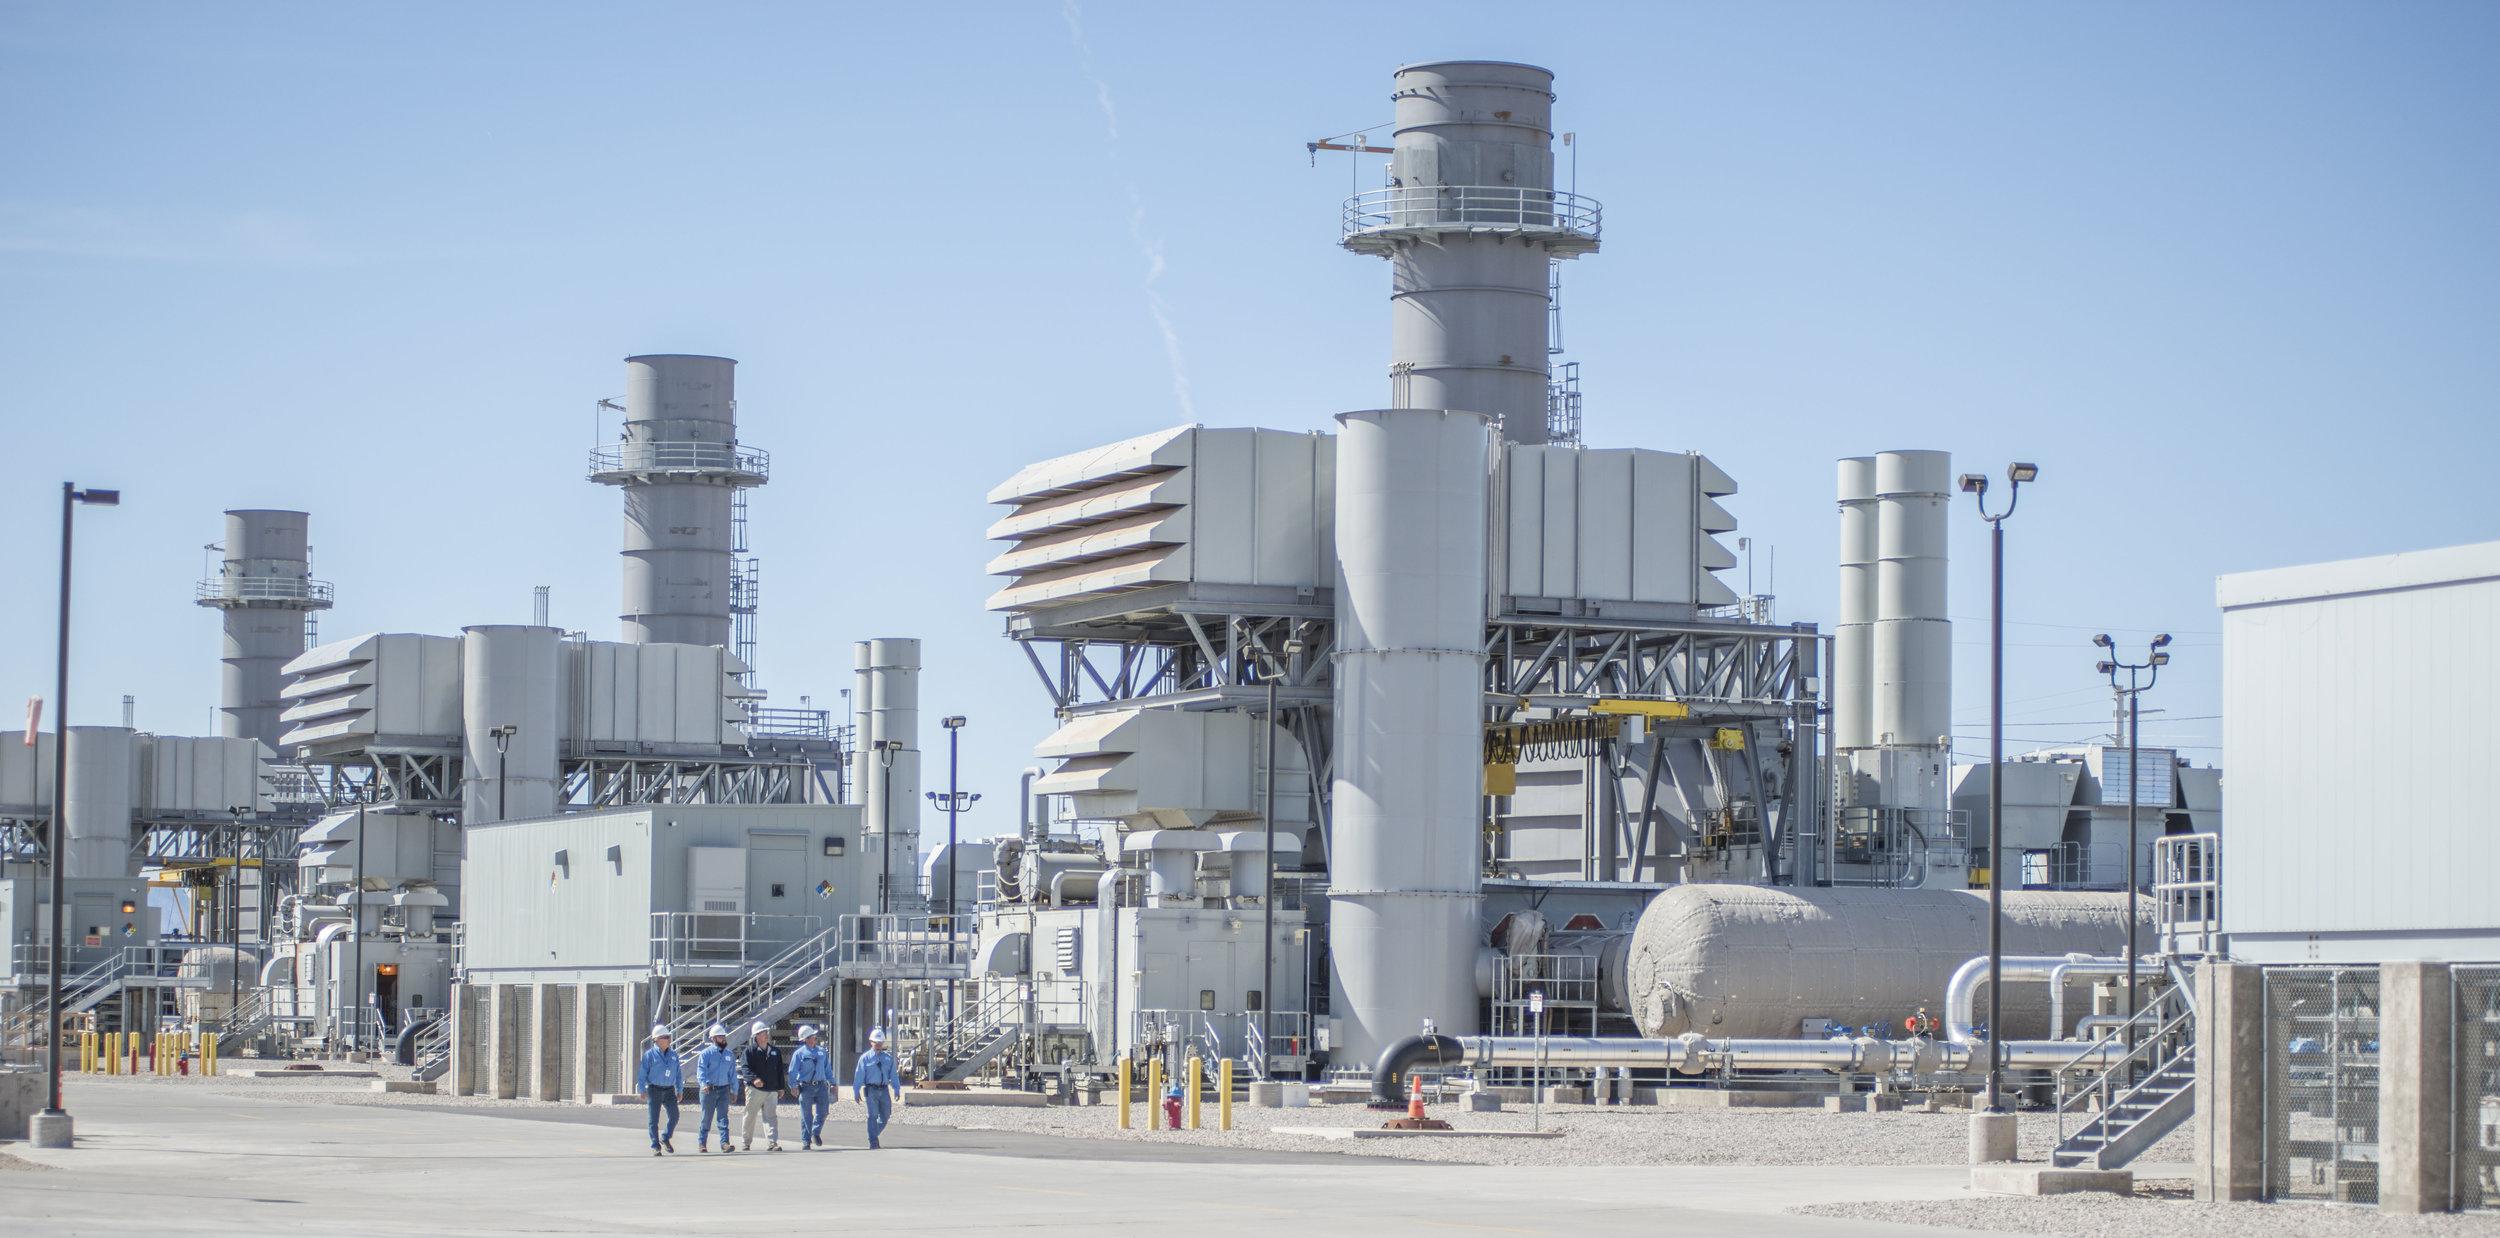 El Paso Electric's East Montana Power Plant